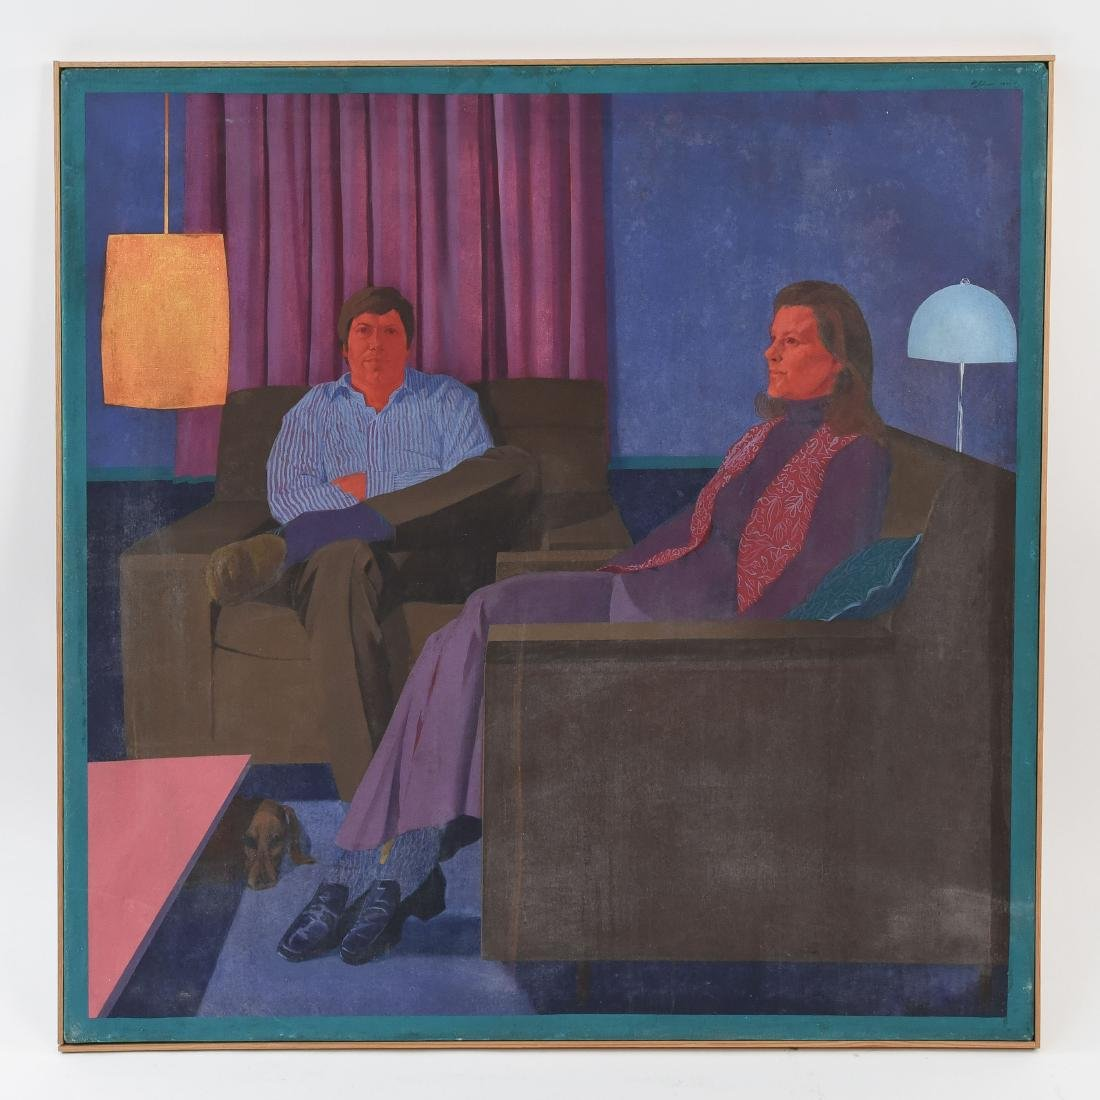 MID-CENTURY MODERN PORTRAIT OF SEATED COUPLE